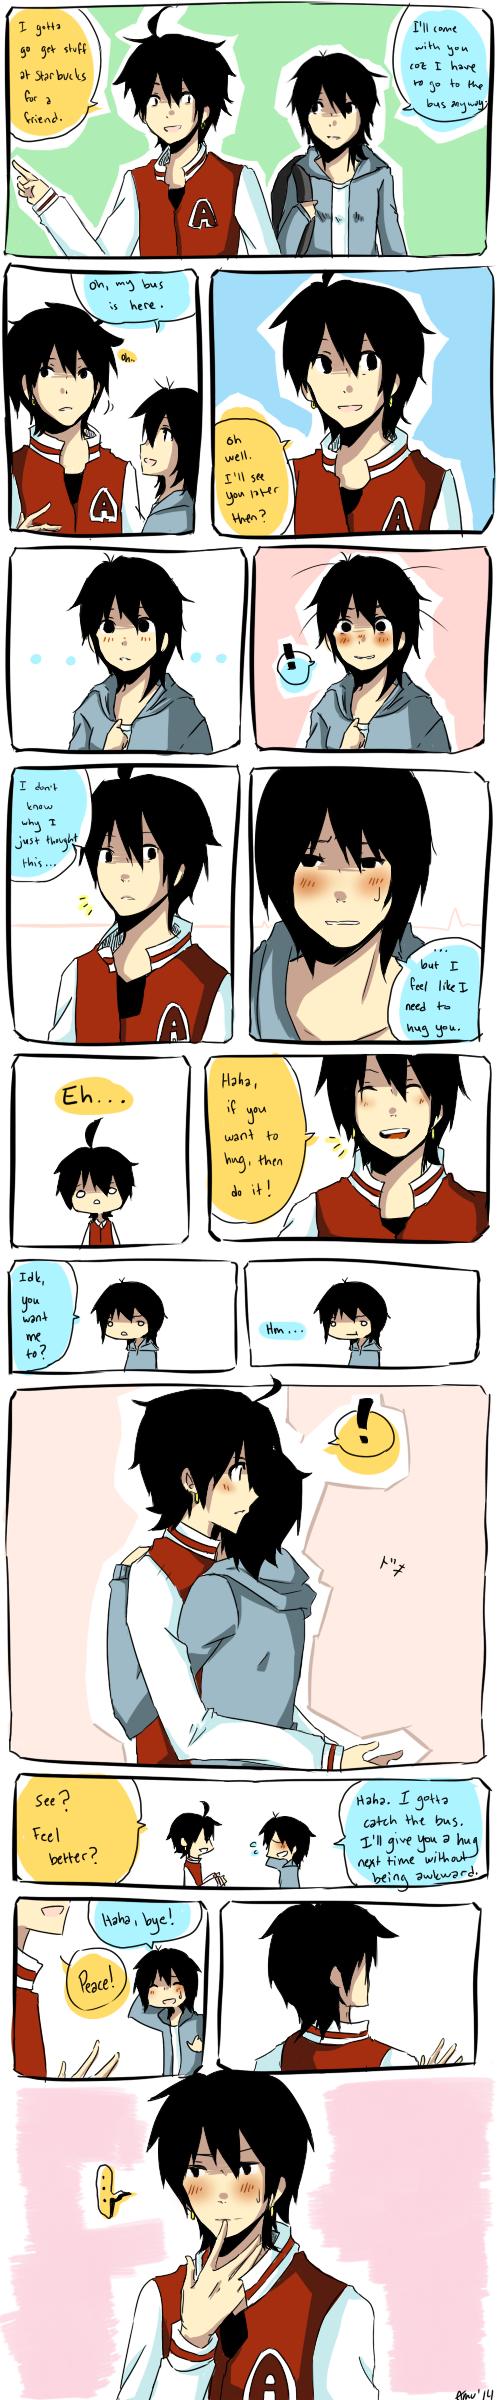 Awkward Hug by djchungy